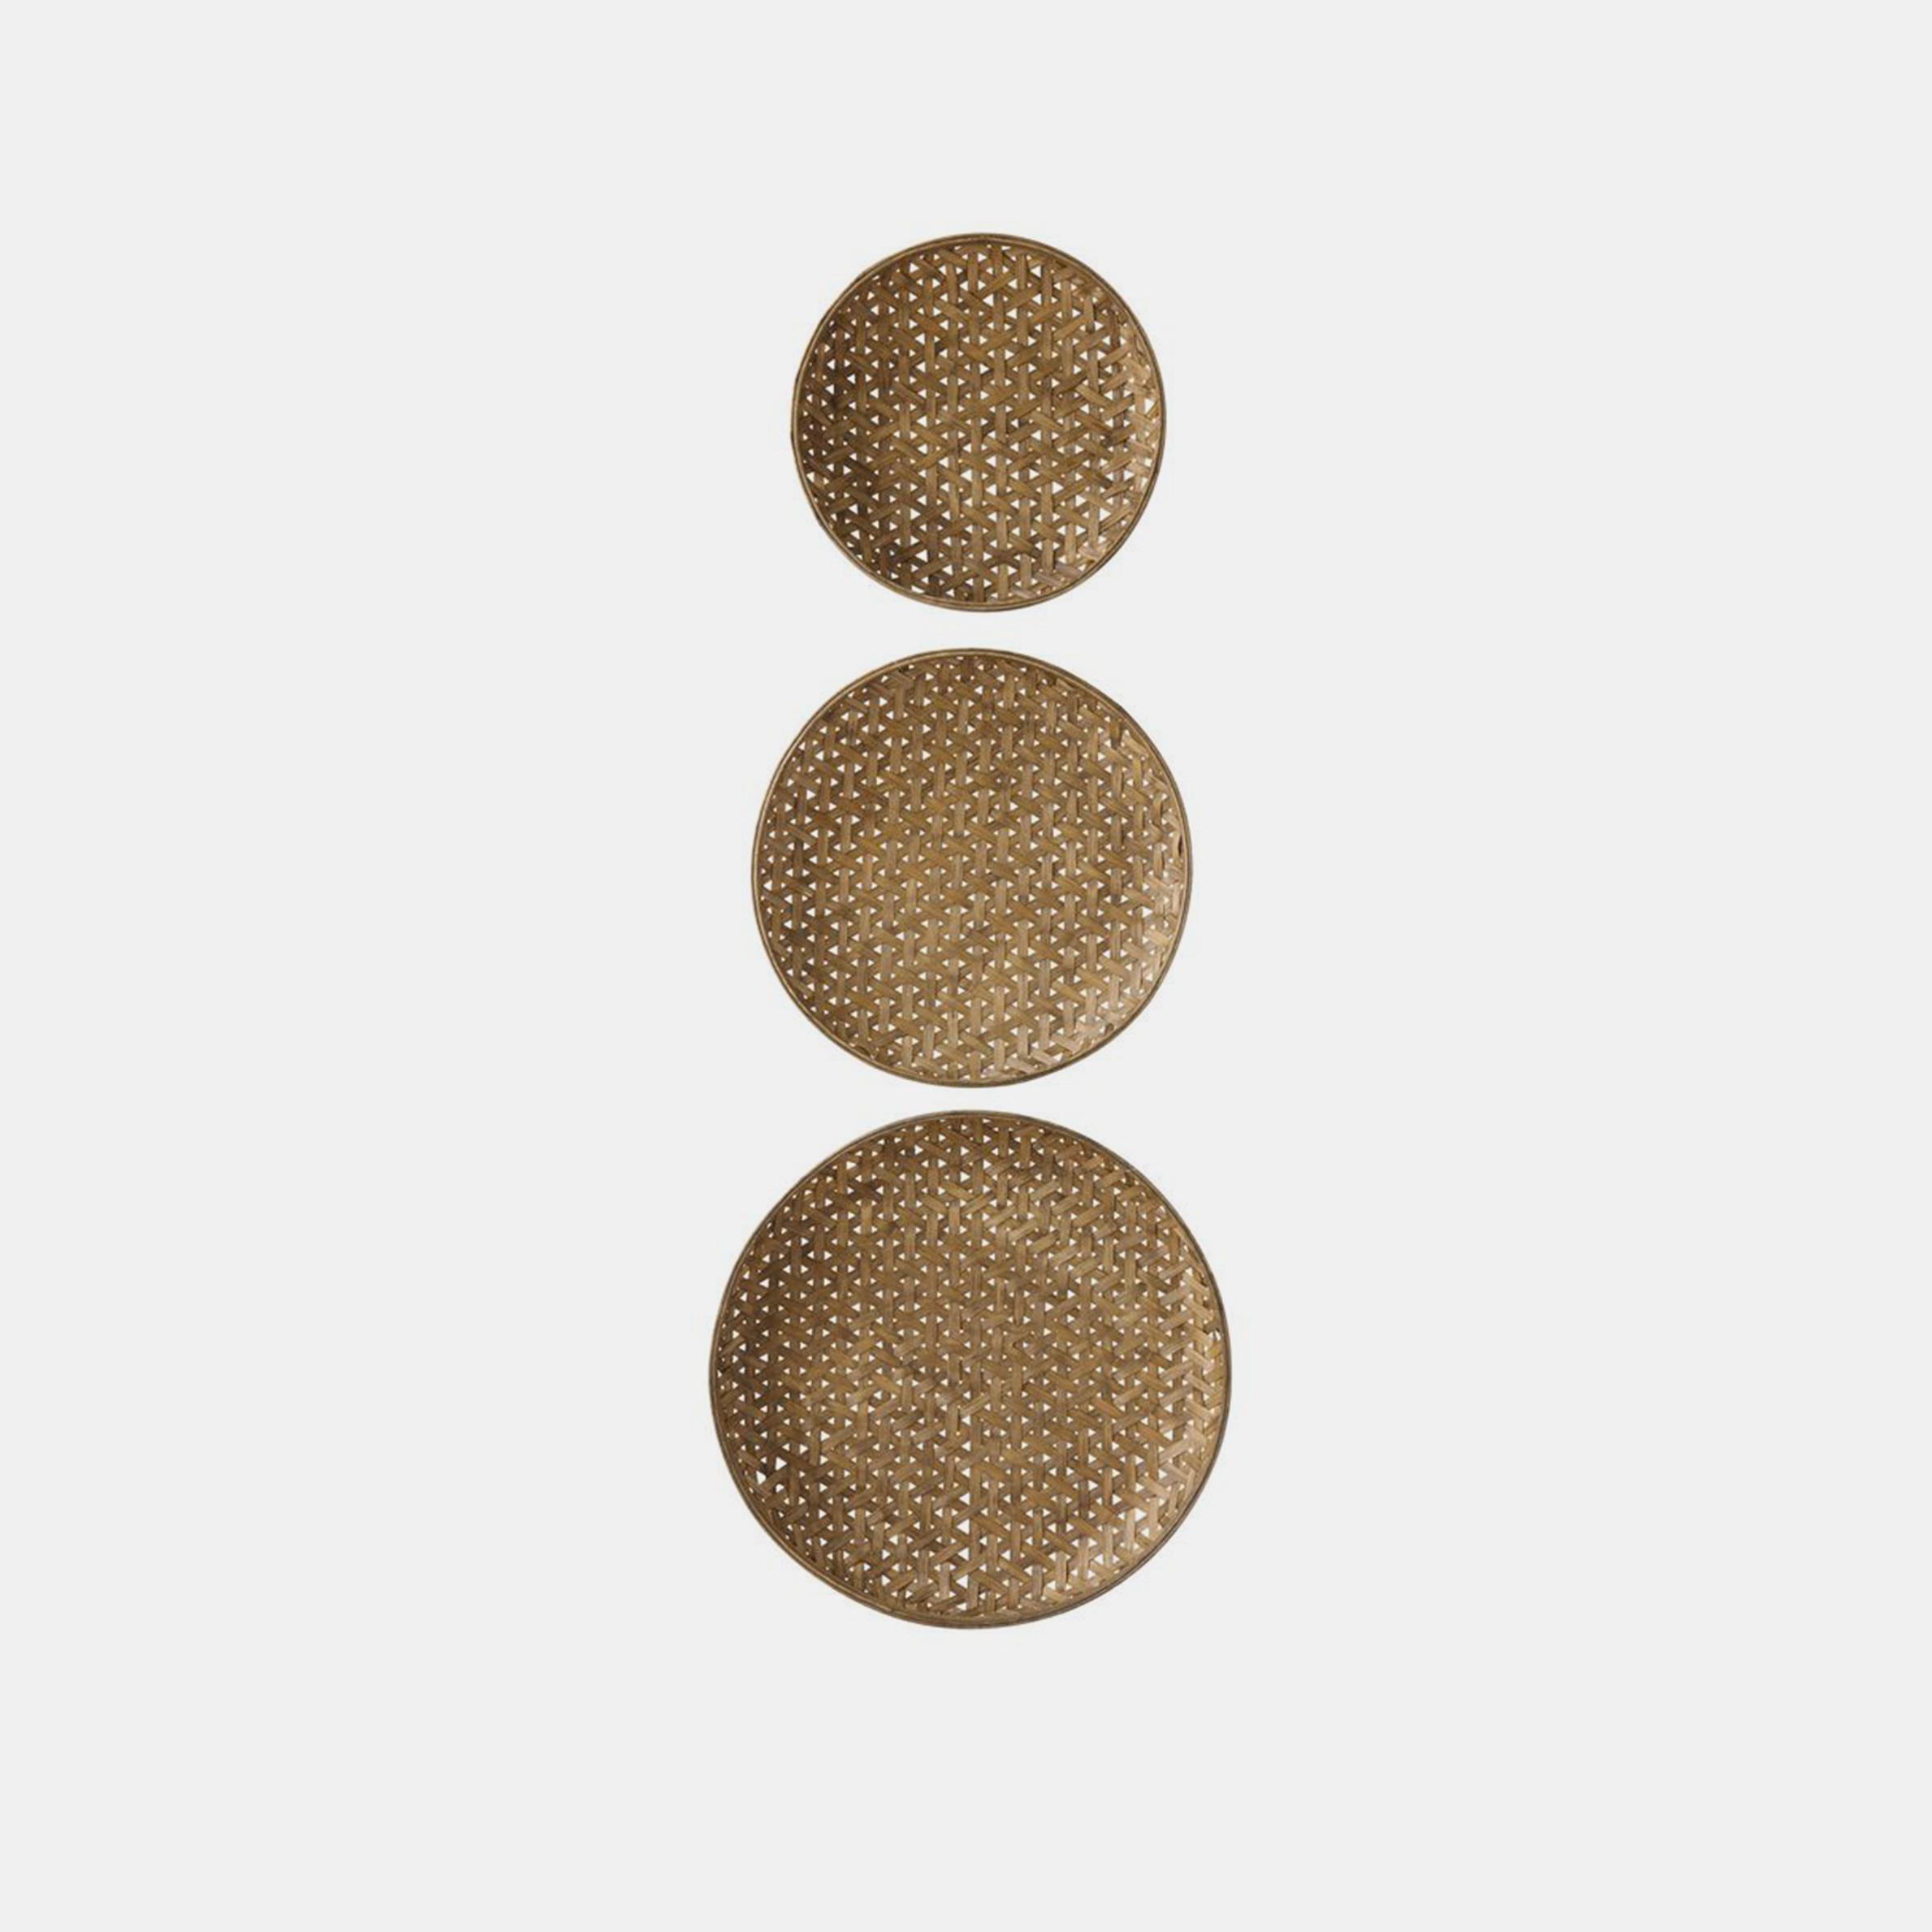 "Round Woven Bamboo Baskets  26"", 22.5"", & 19.25"" round SKU484CCO"